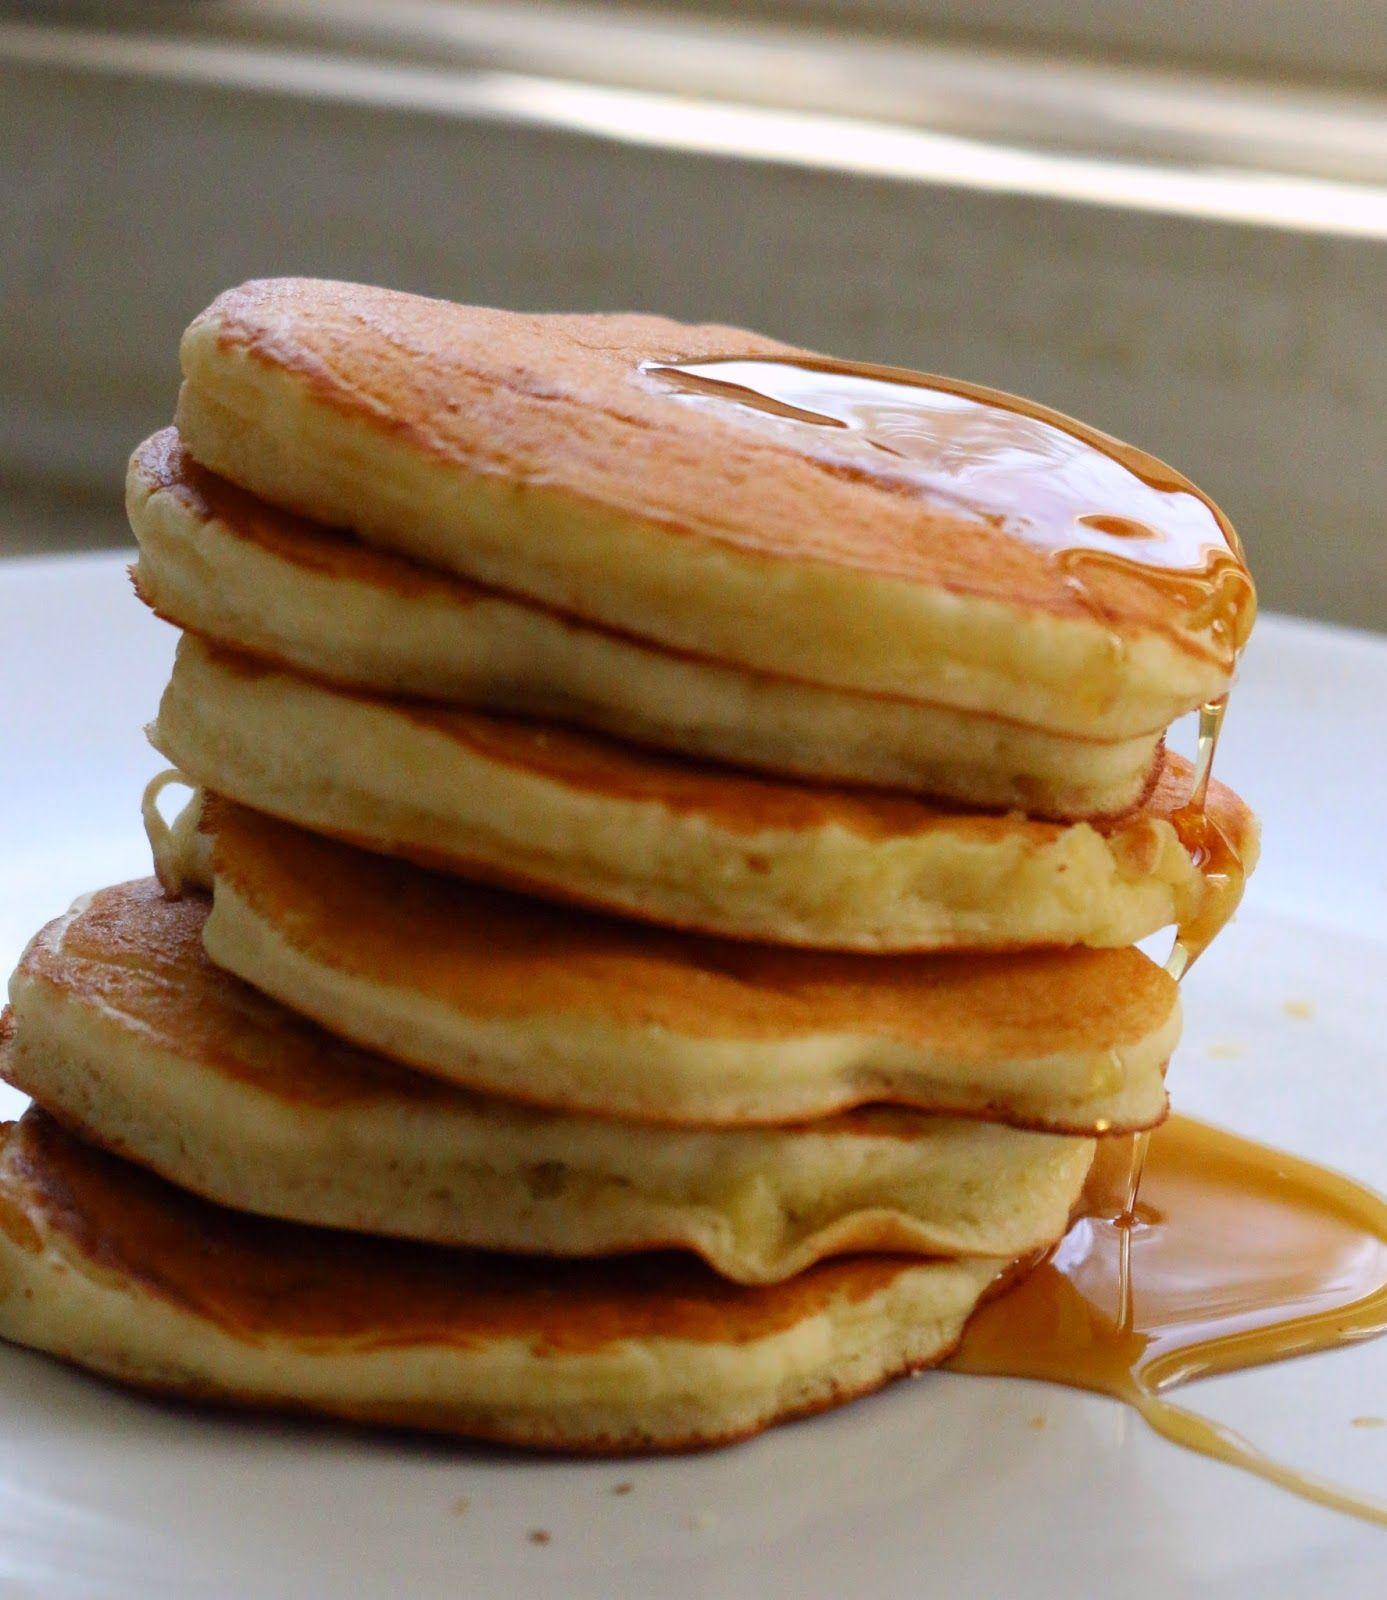 Polly S Pancake Parlor Recipes Dairy Free Vegan Pancakes From Polly S Mix Vegan Pancakes Pancakes Dairy Free